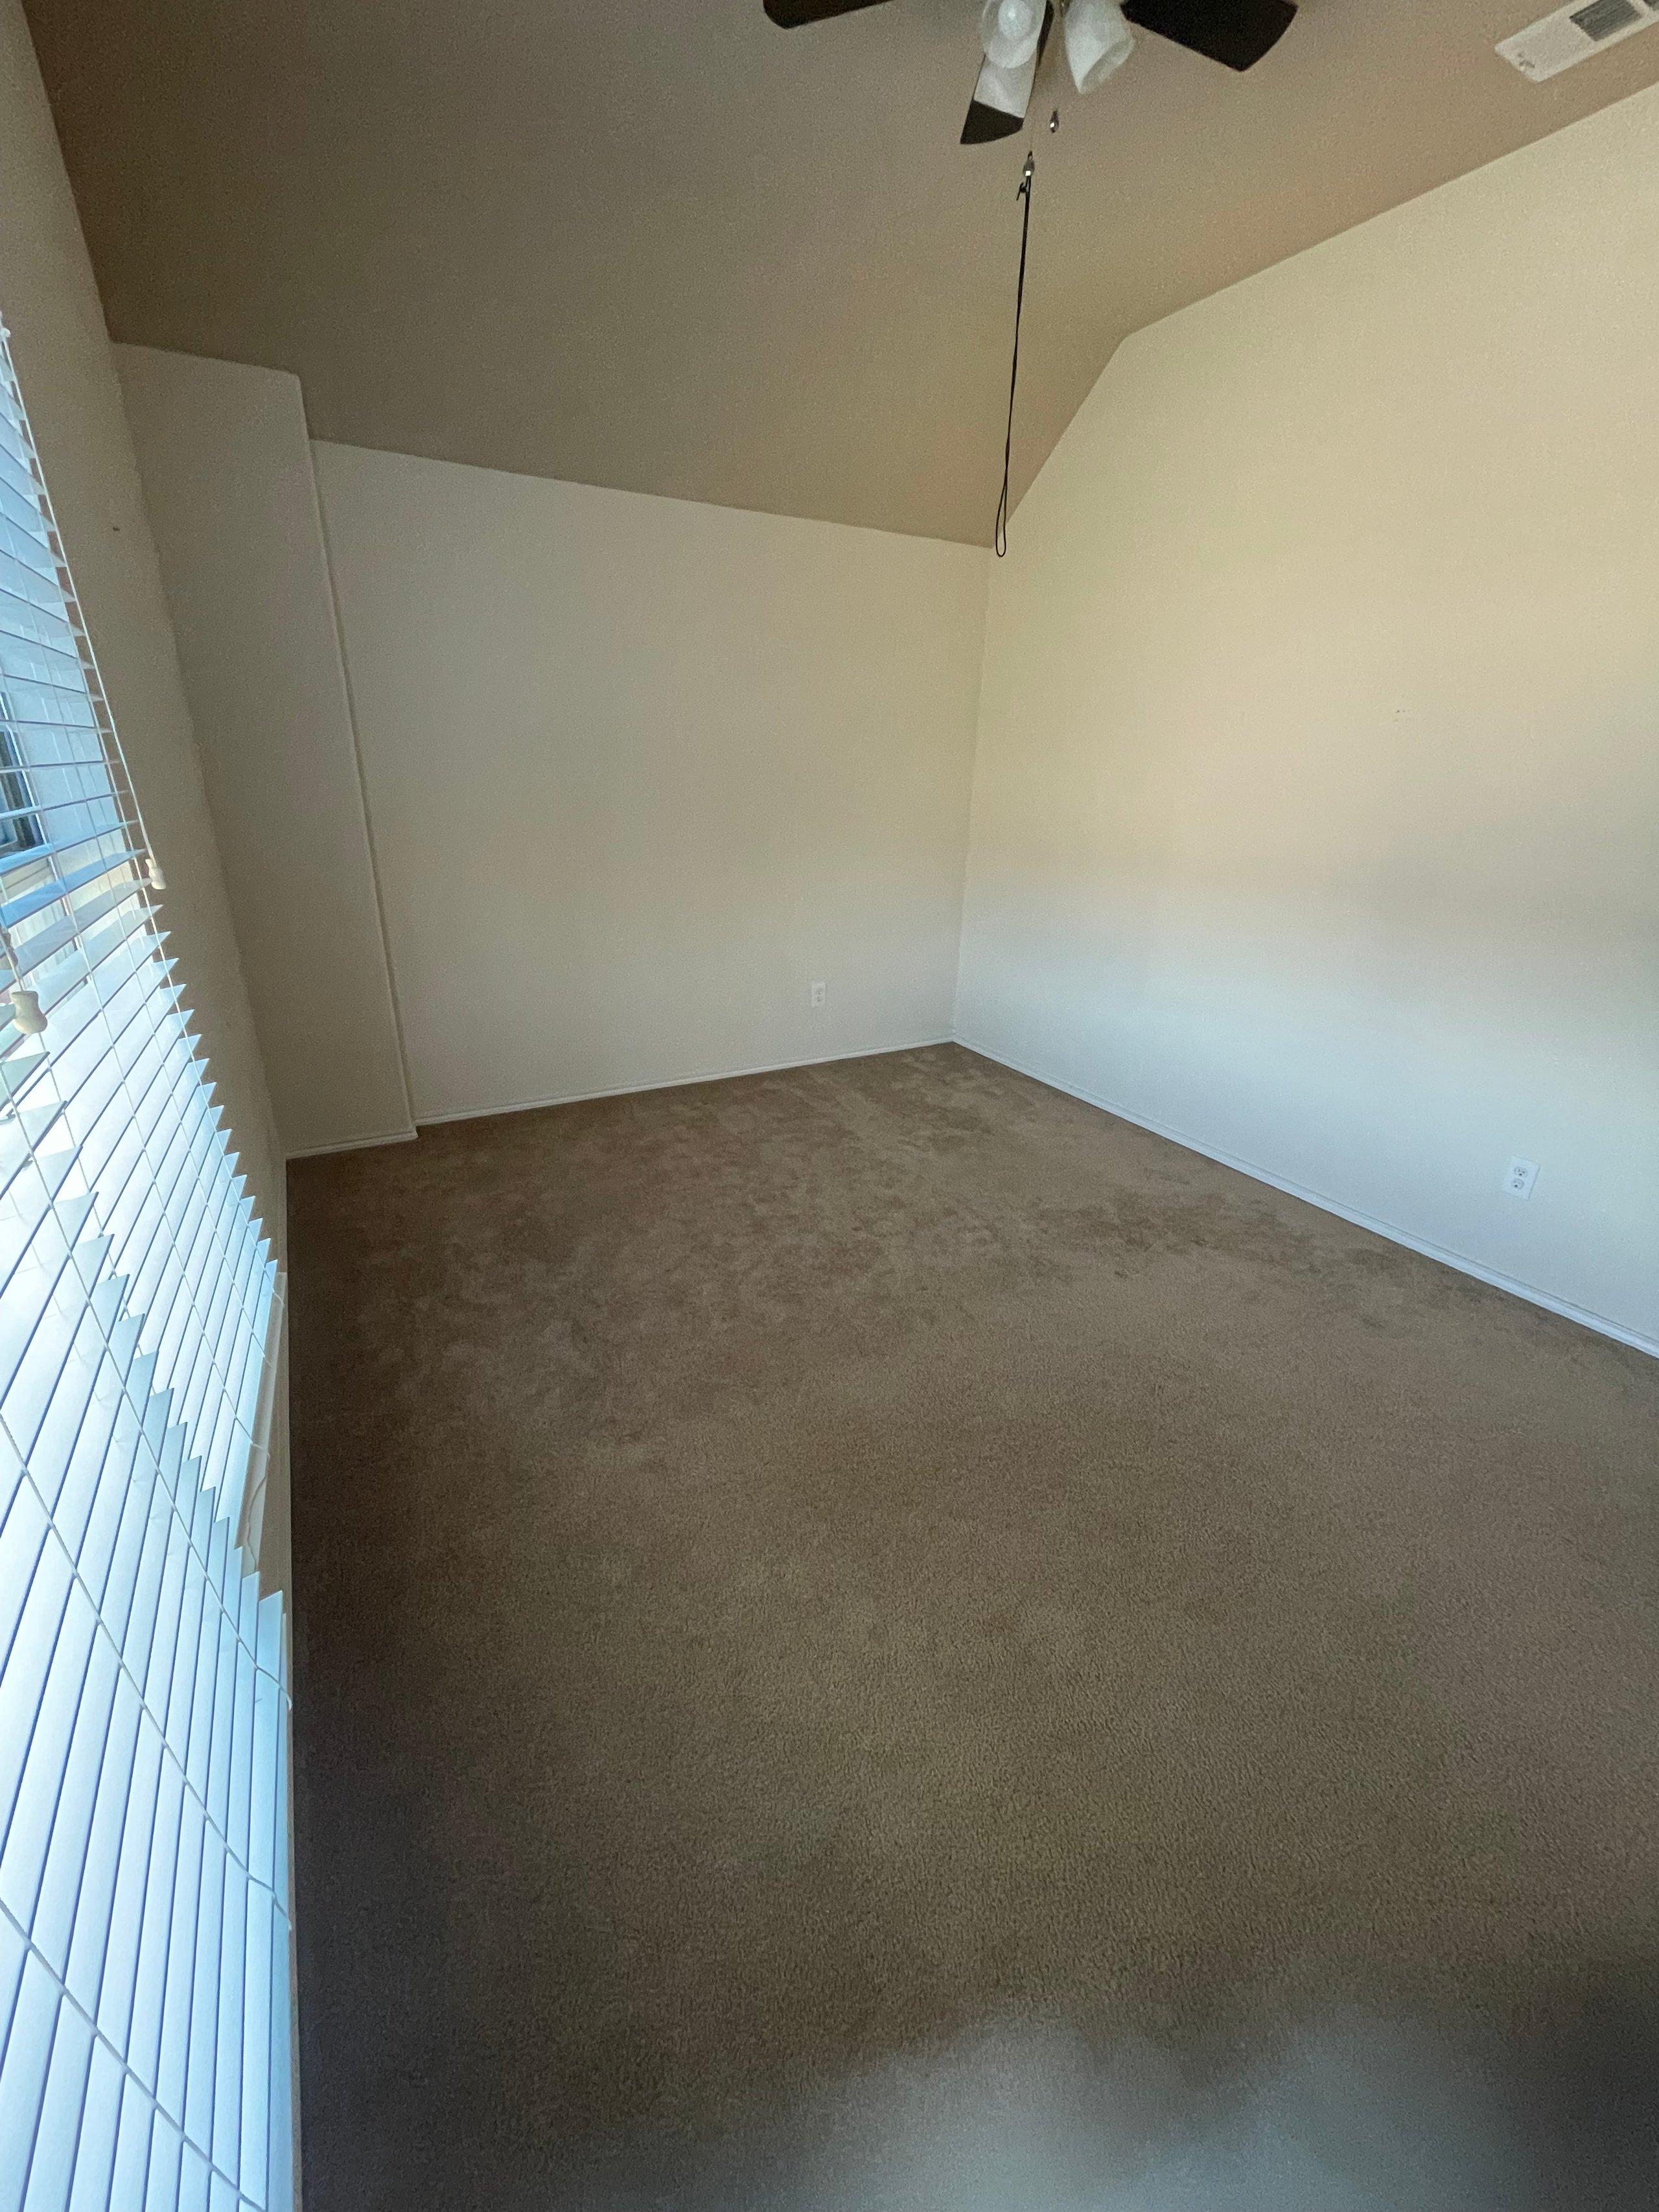 14x10 Bedroom self storage unit